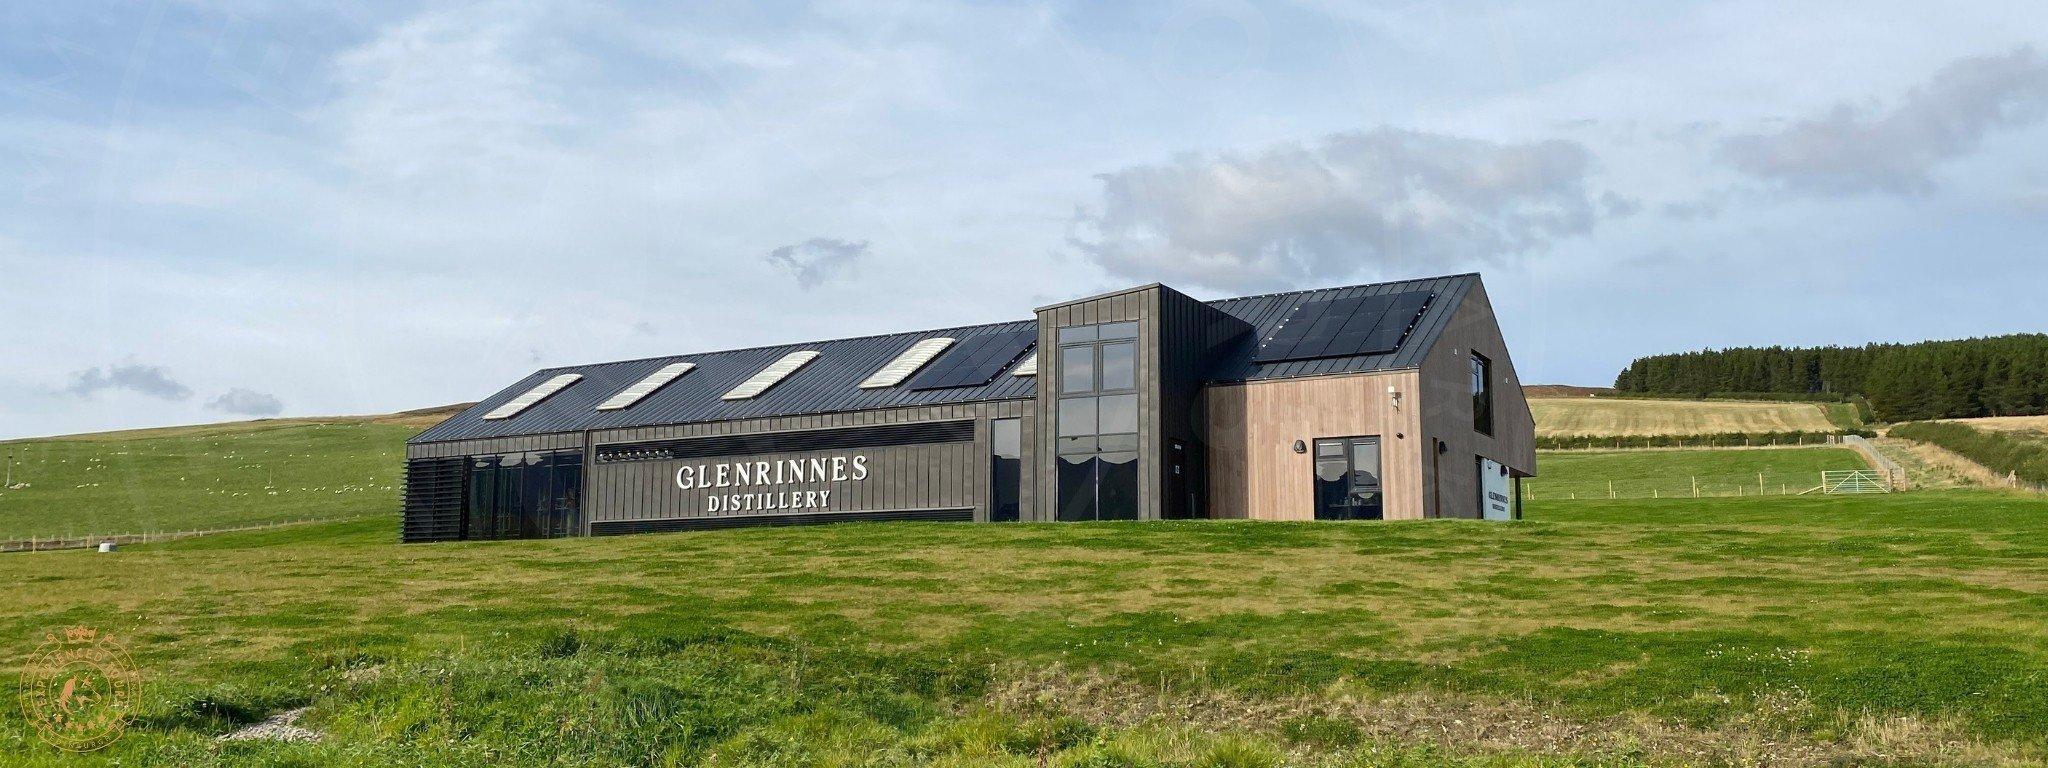 Glenrinnes Distillery